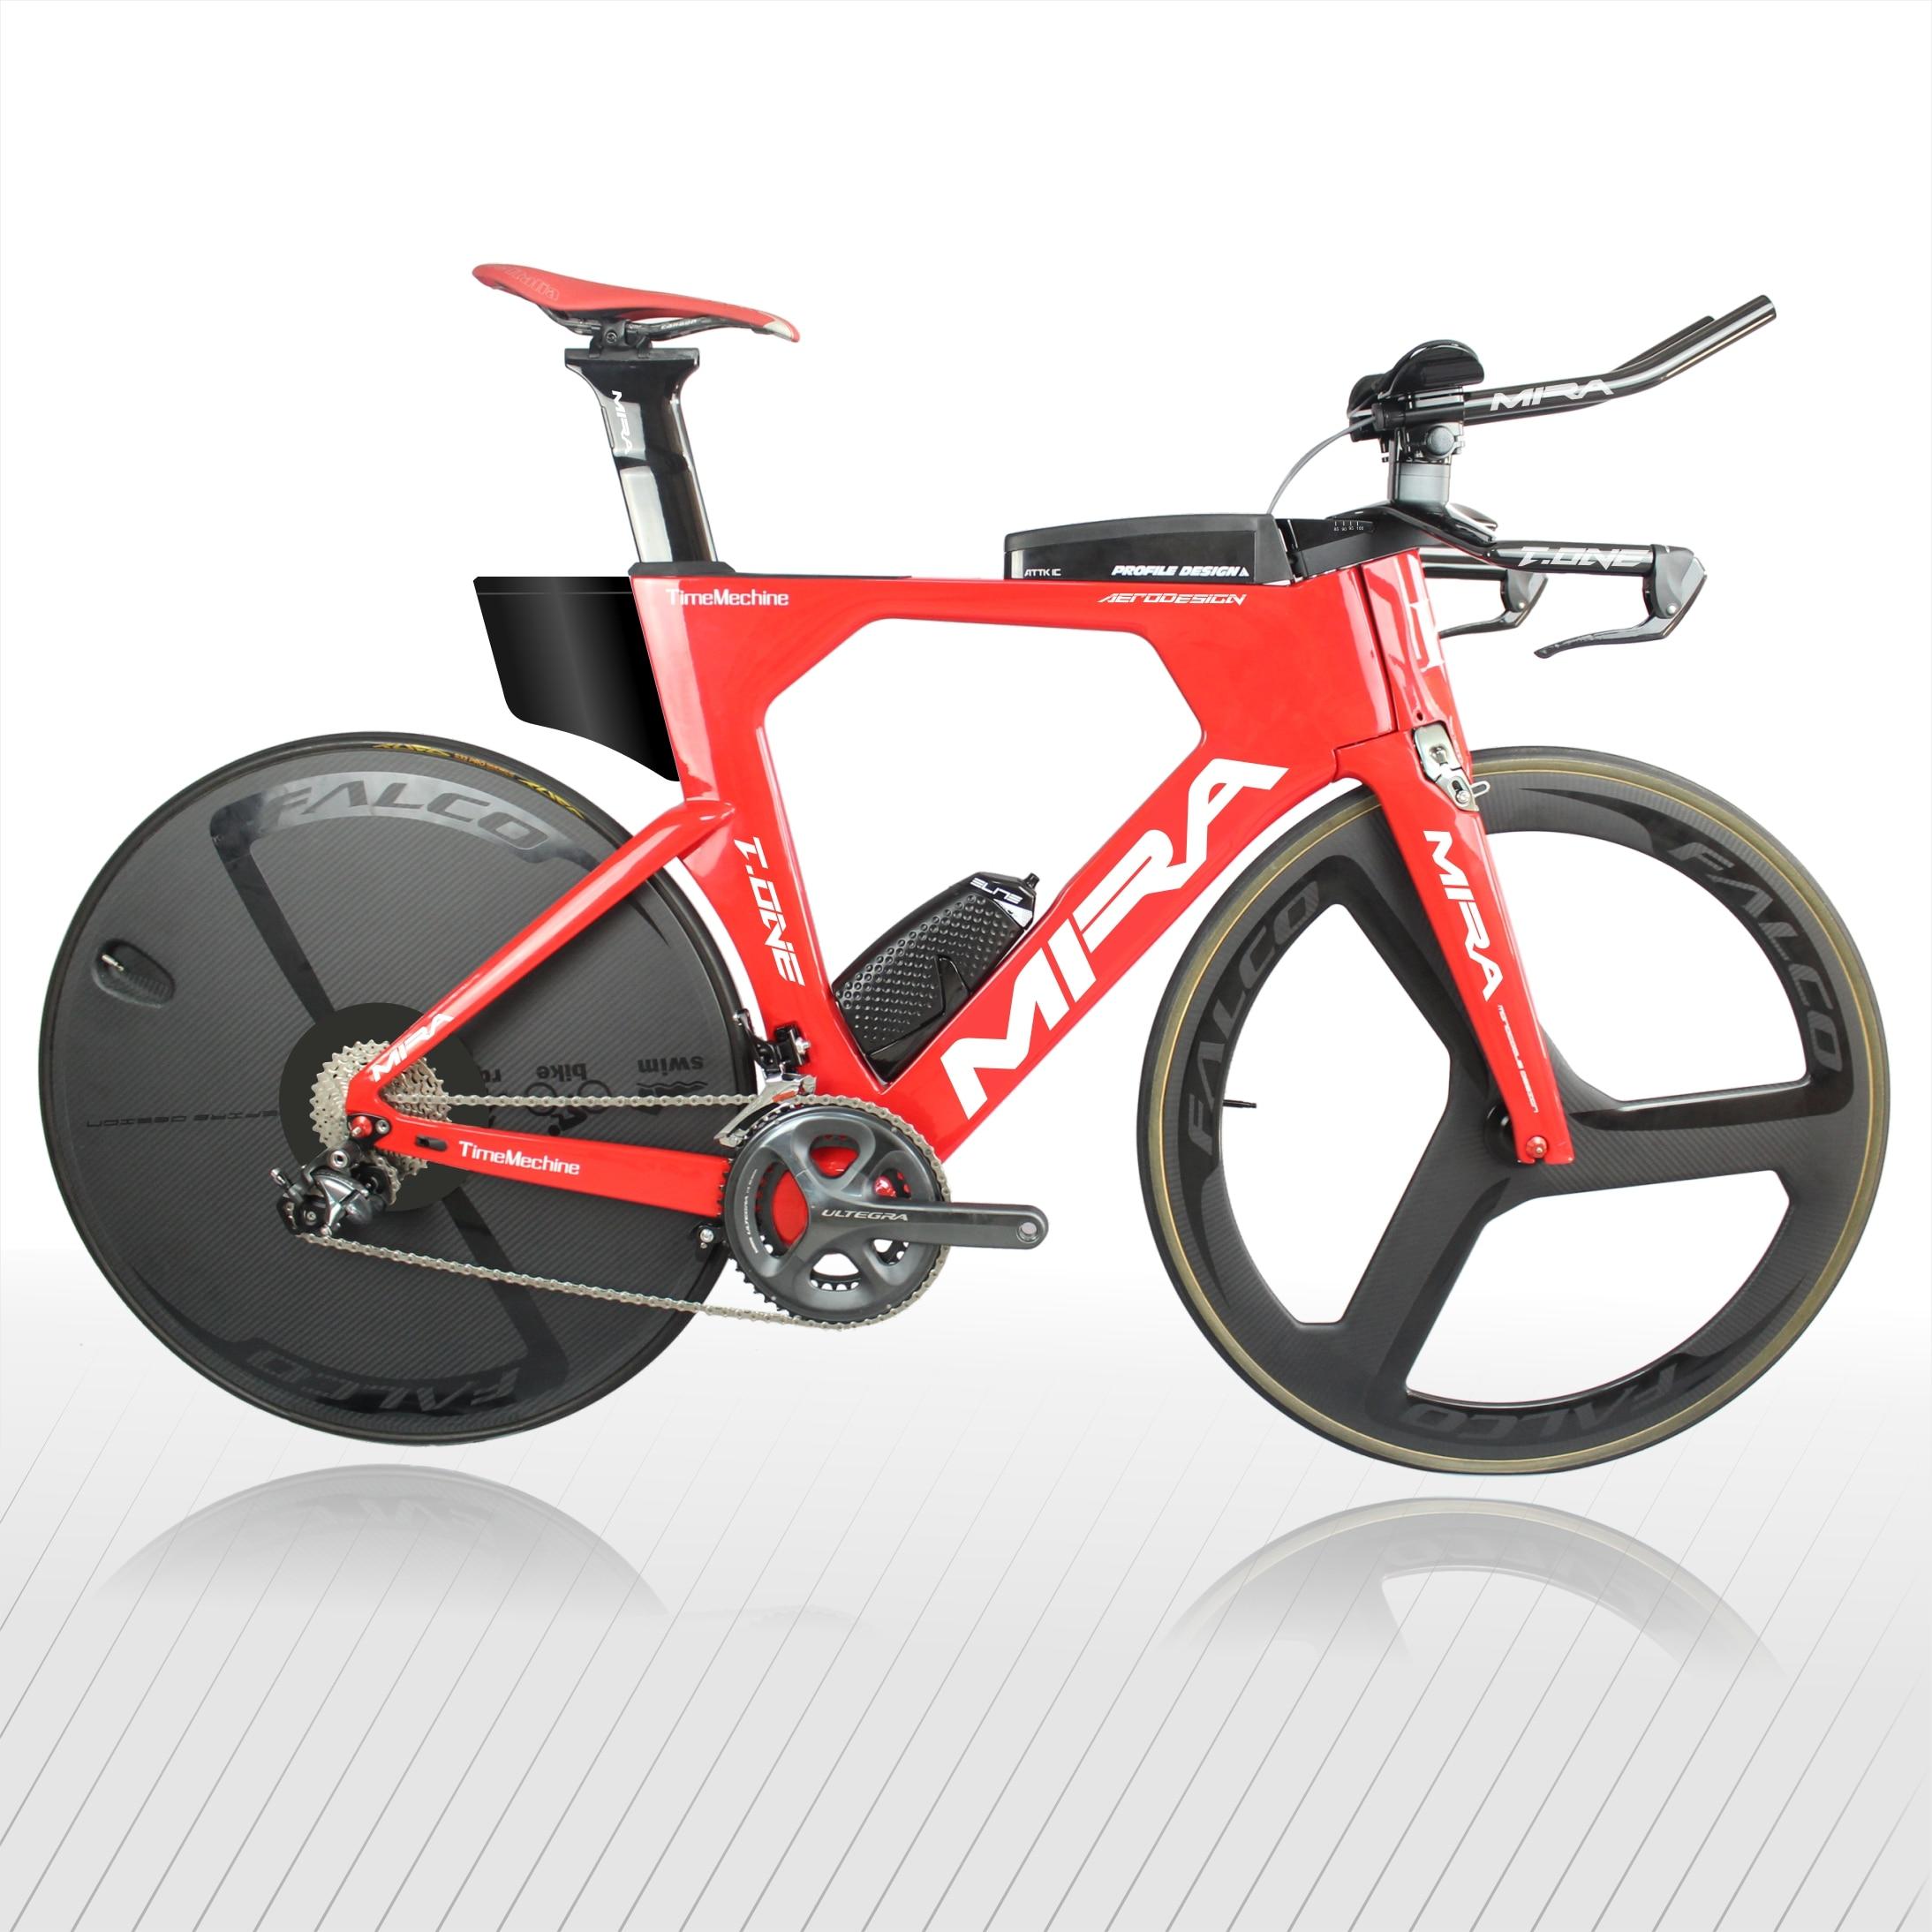 Bicicleta de carbono Aero triatlón T-ONE, estructura de carbón, bicicleta TT de fábrica de China V, freno de alta calidad 48/52/54/56/58cm